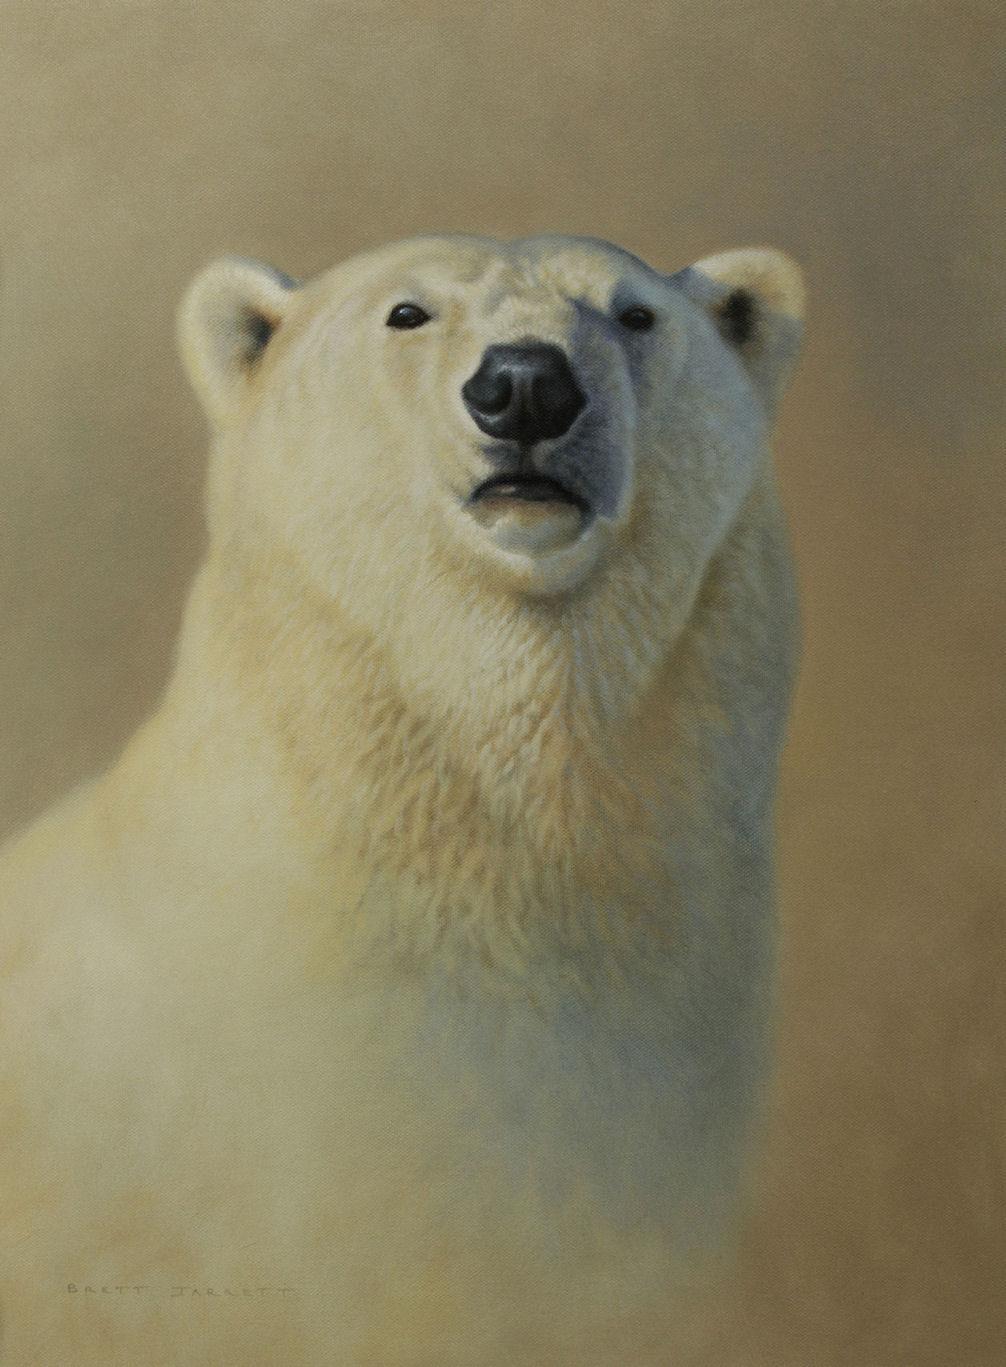 'Imposing Presence' Polar Bear 45 h x 32